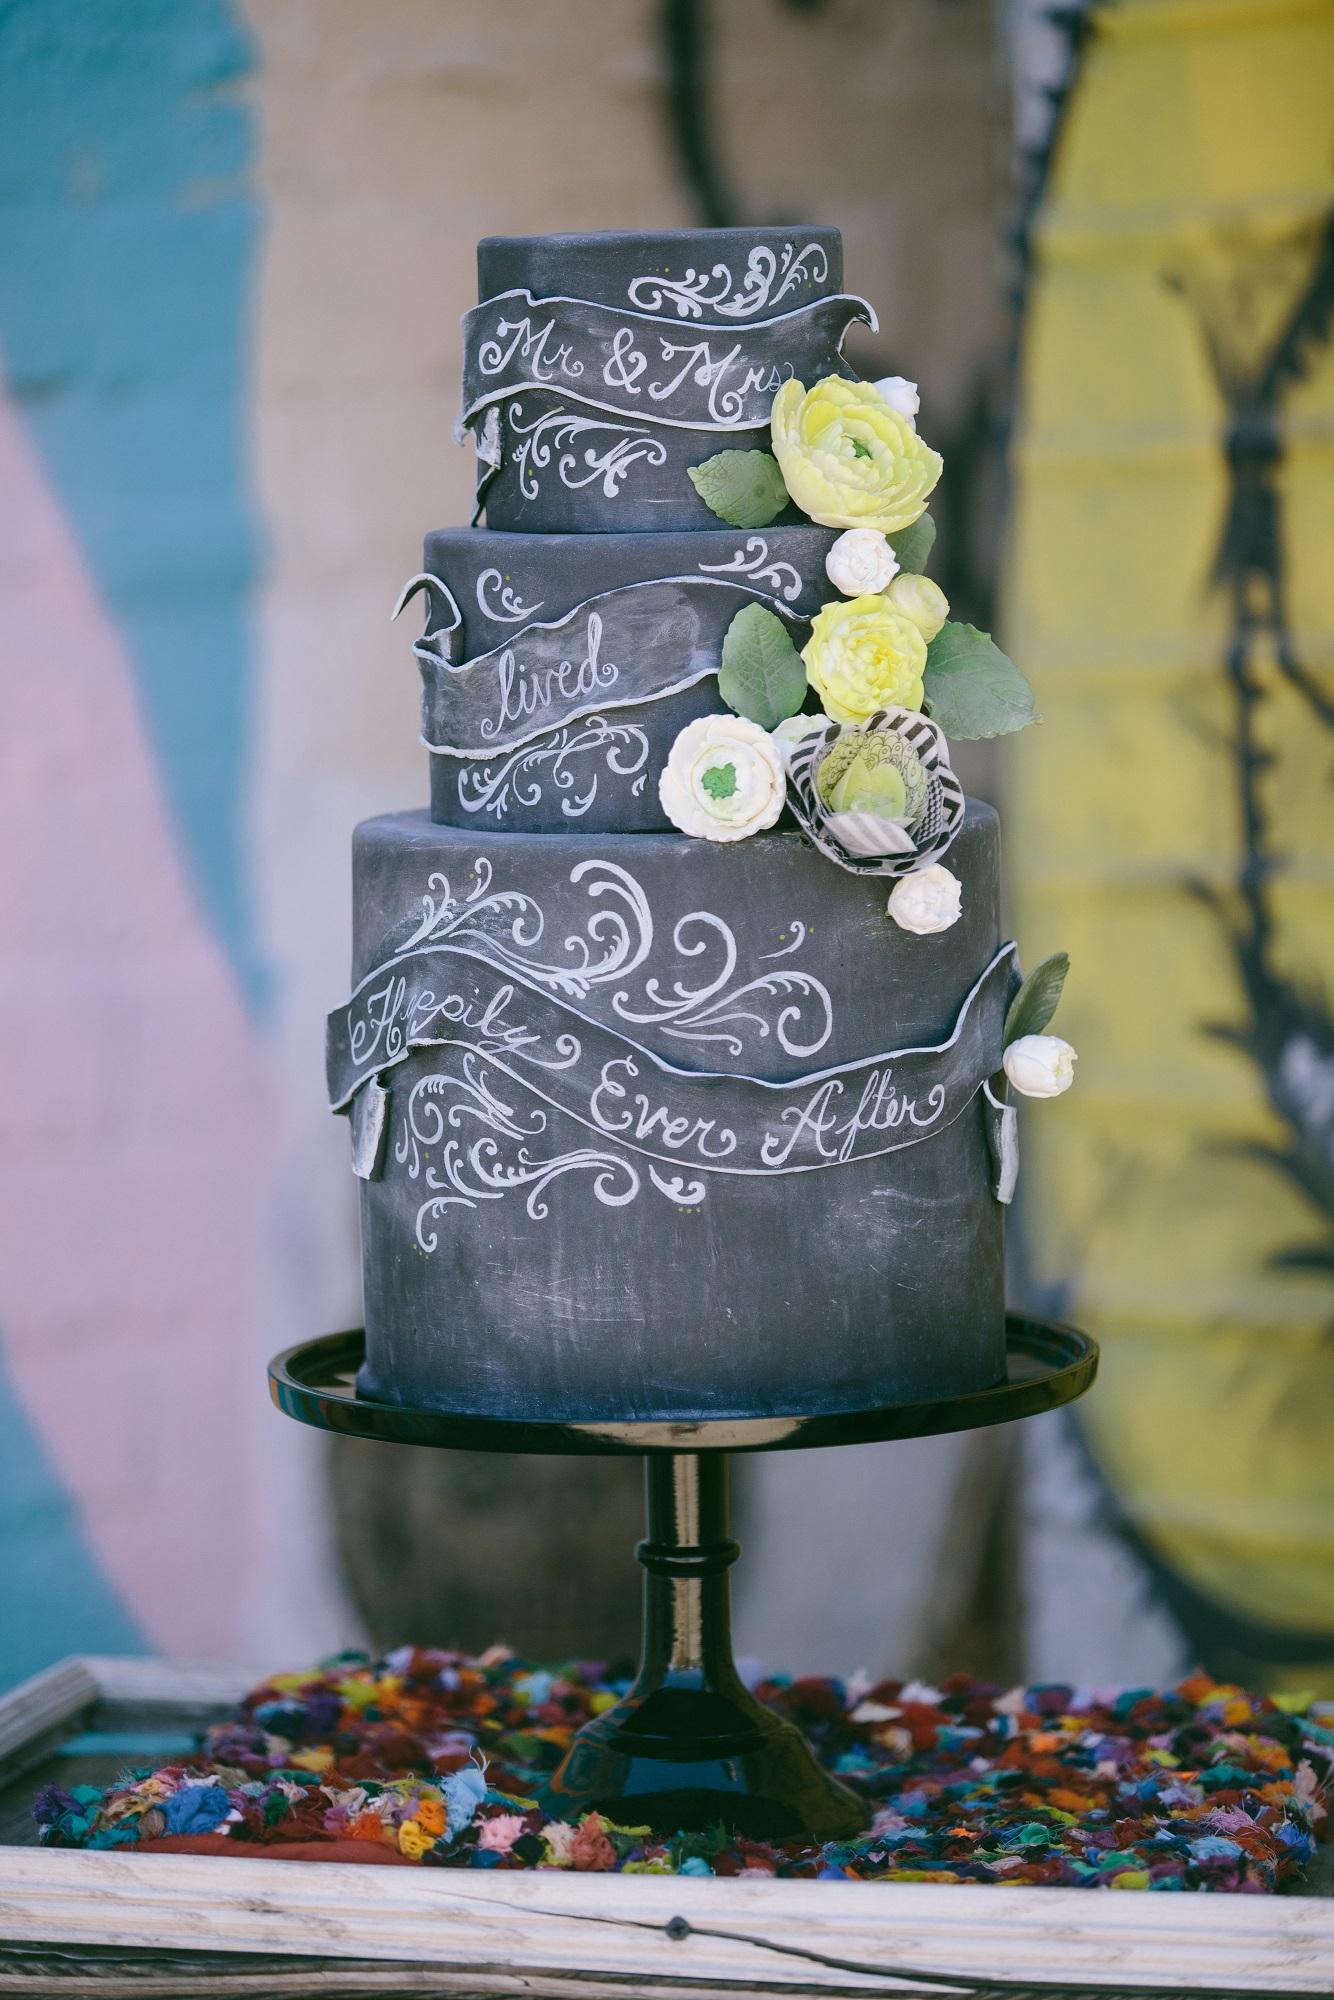 chalkboard-style-cake-with-sugar-wafer-flowers-sweet-cheeks-baking-websize-taylor-abeel-photo_0